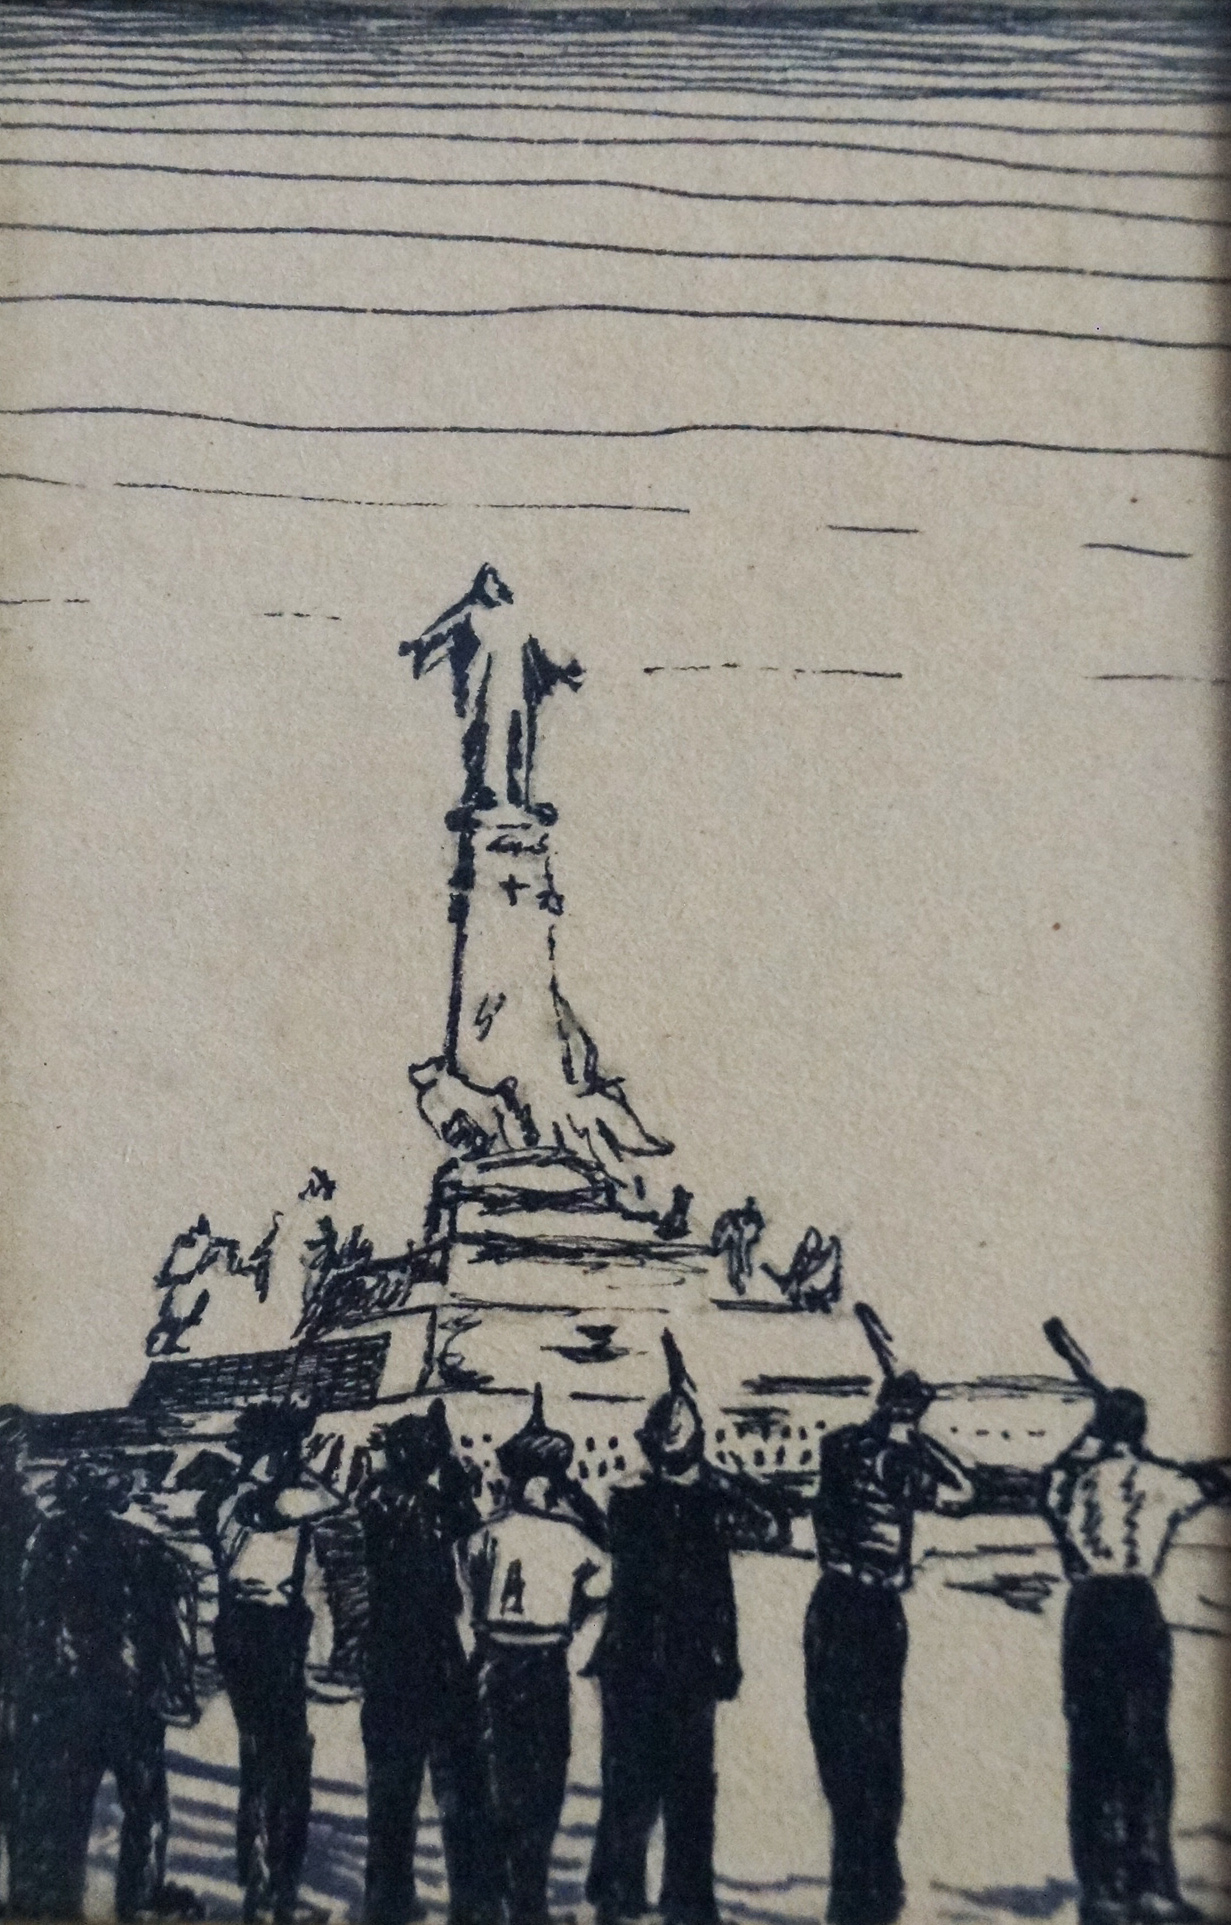 Executing Christ (Spanish Civil War)